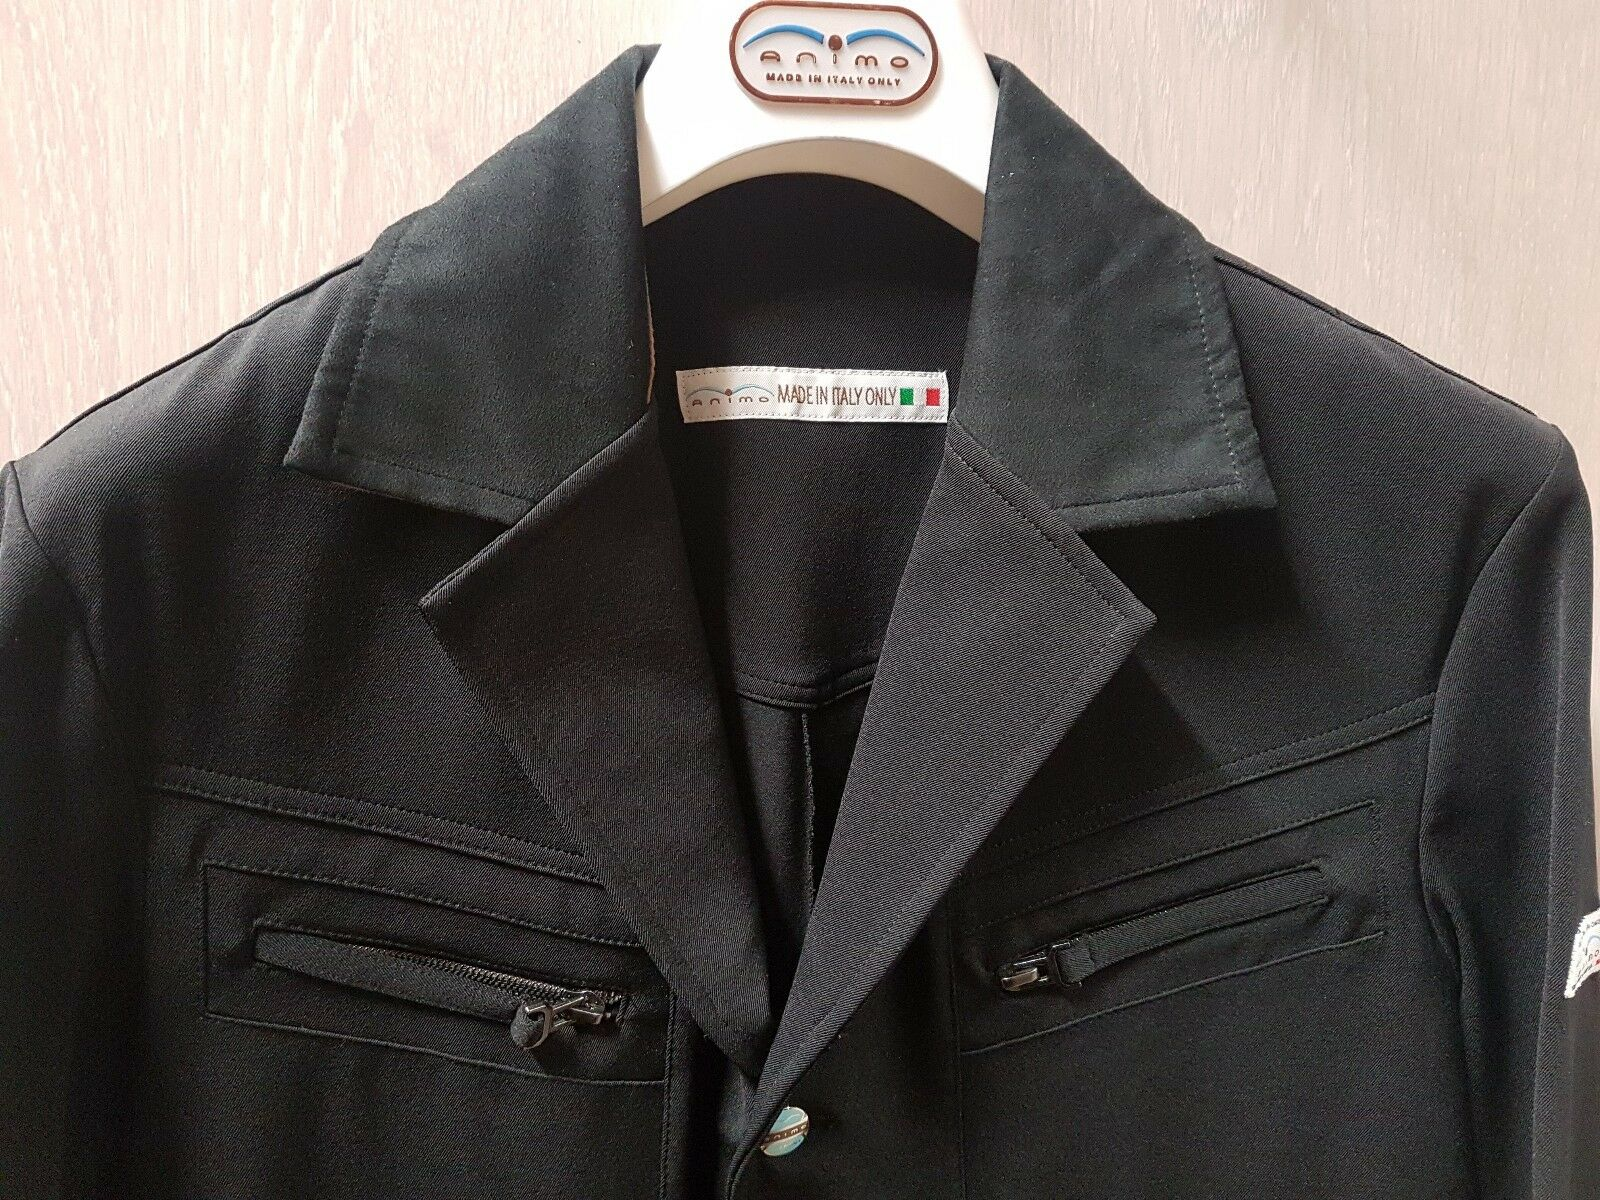 Animo turnierjacket 46 Istria chaqueta chaqueta showjacket negro negro negro caballeros